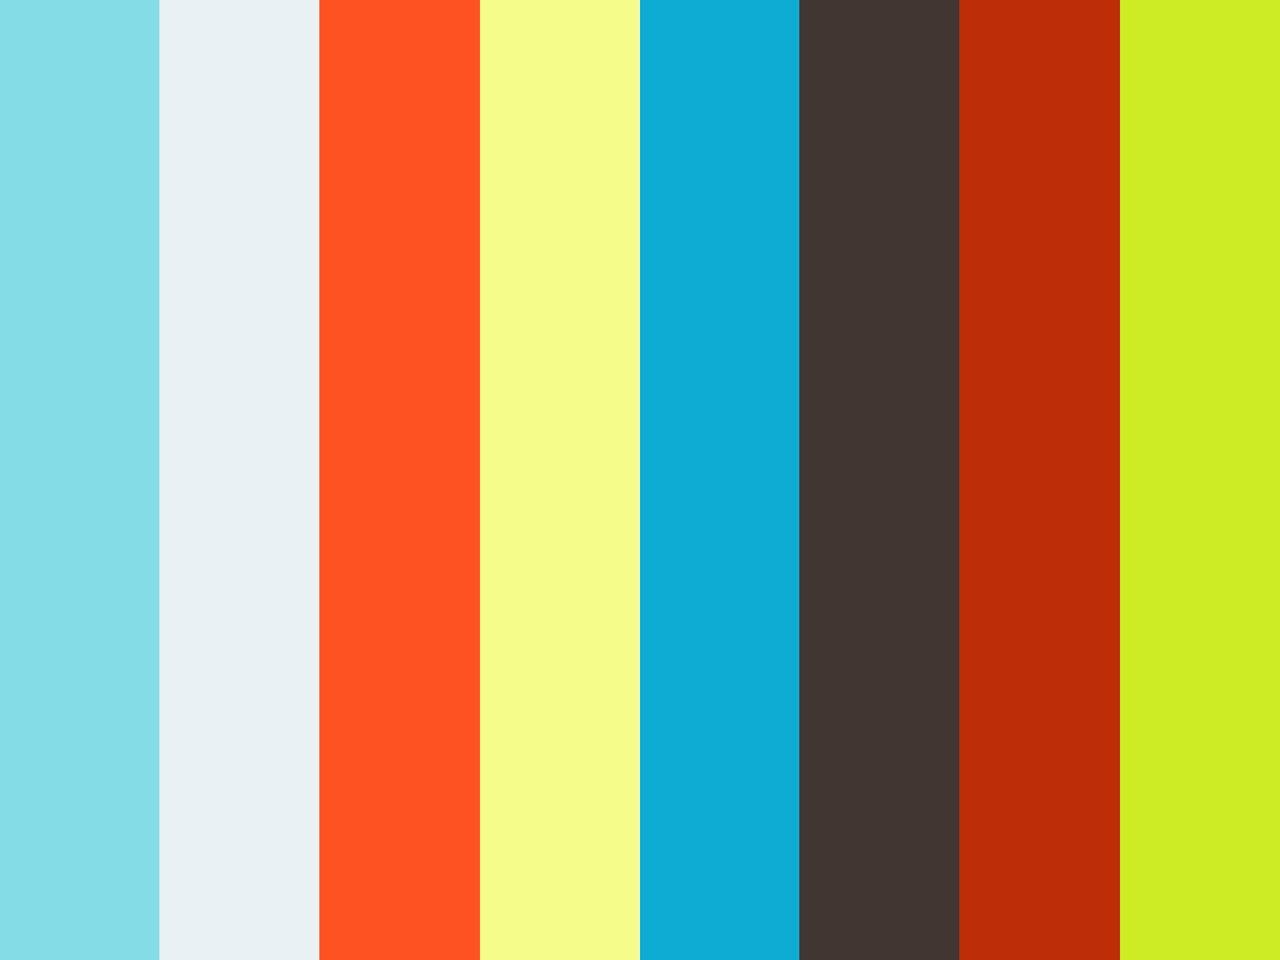 Bud Light - The Bud Knight [720p]